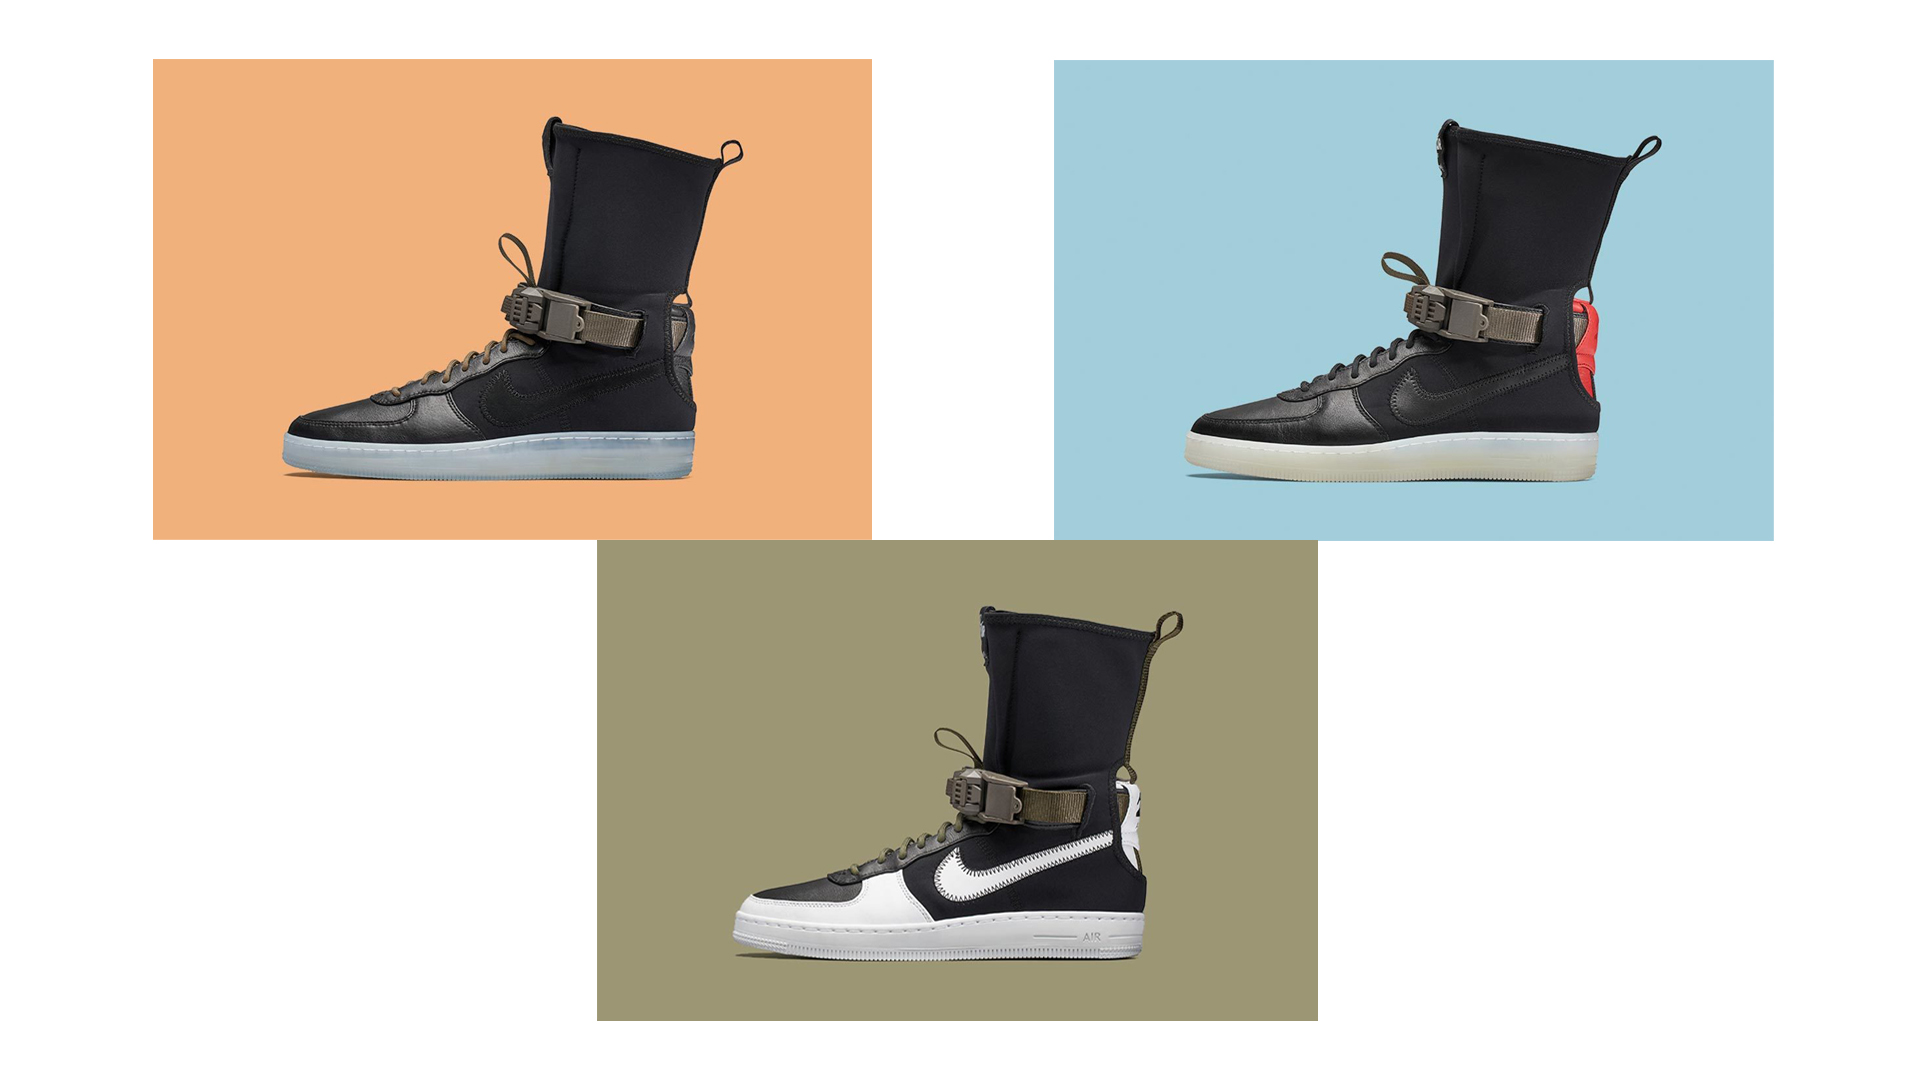 ACRONYM x Nike Downtown // Kép: SneakerFreaker